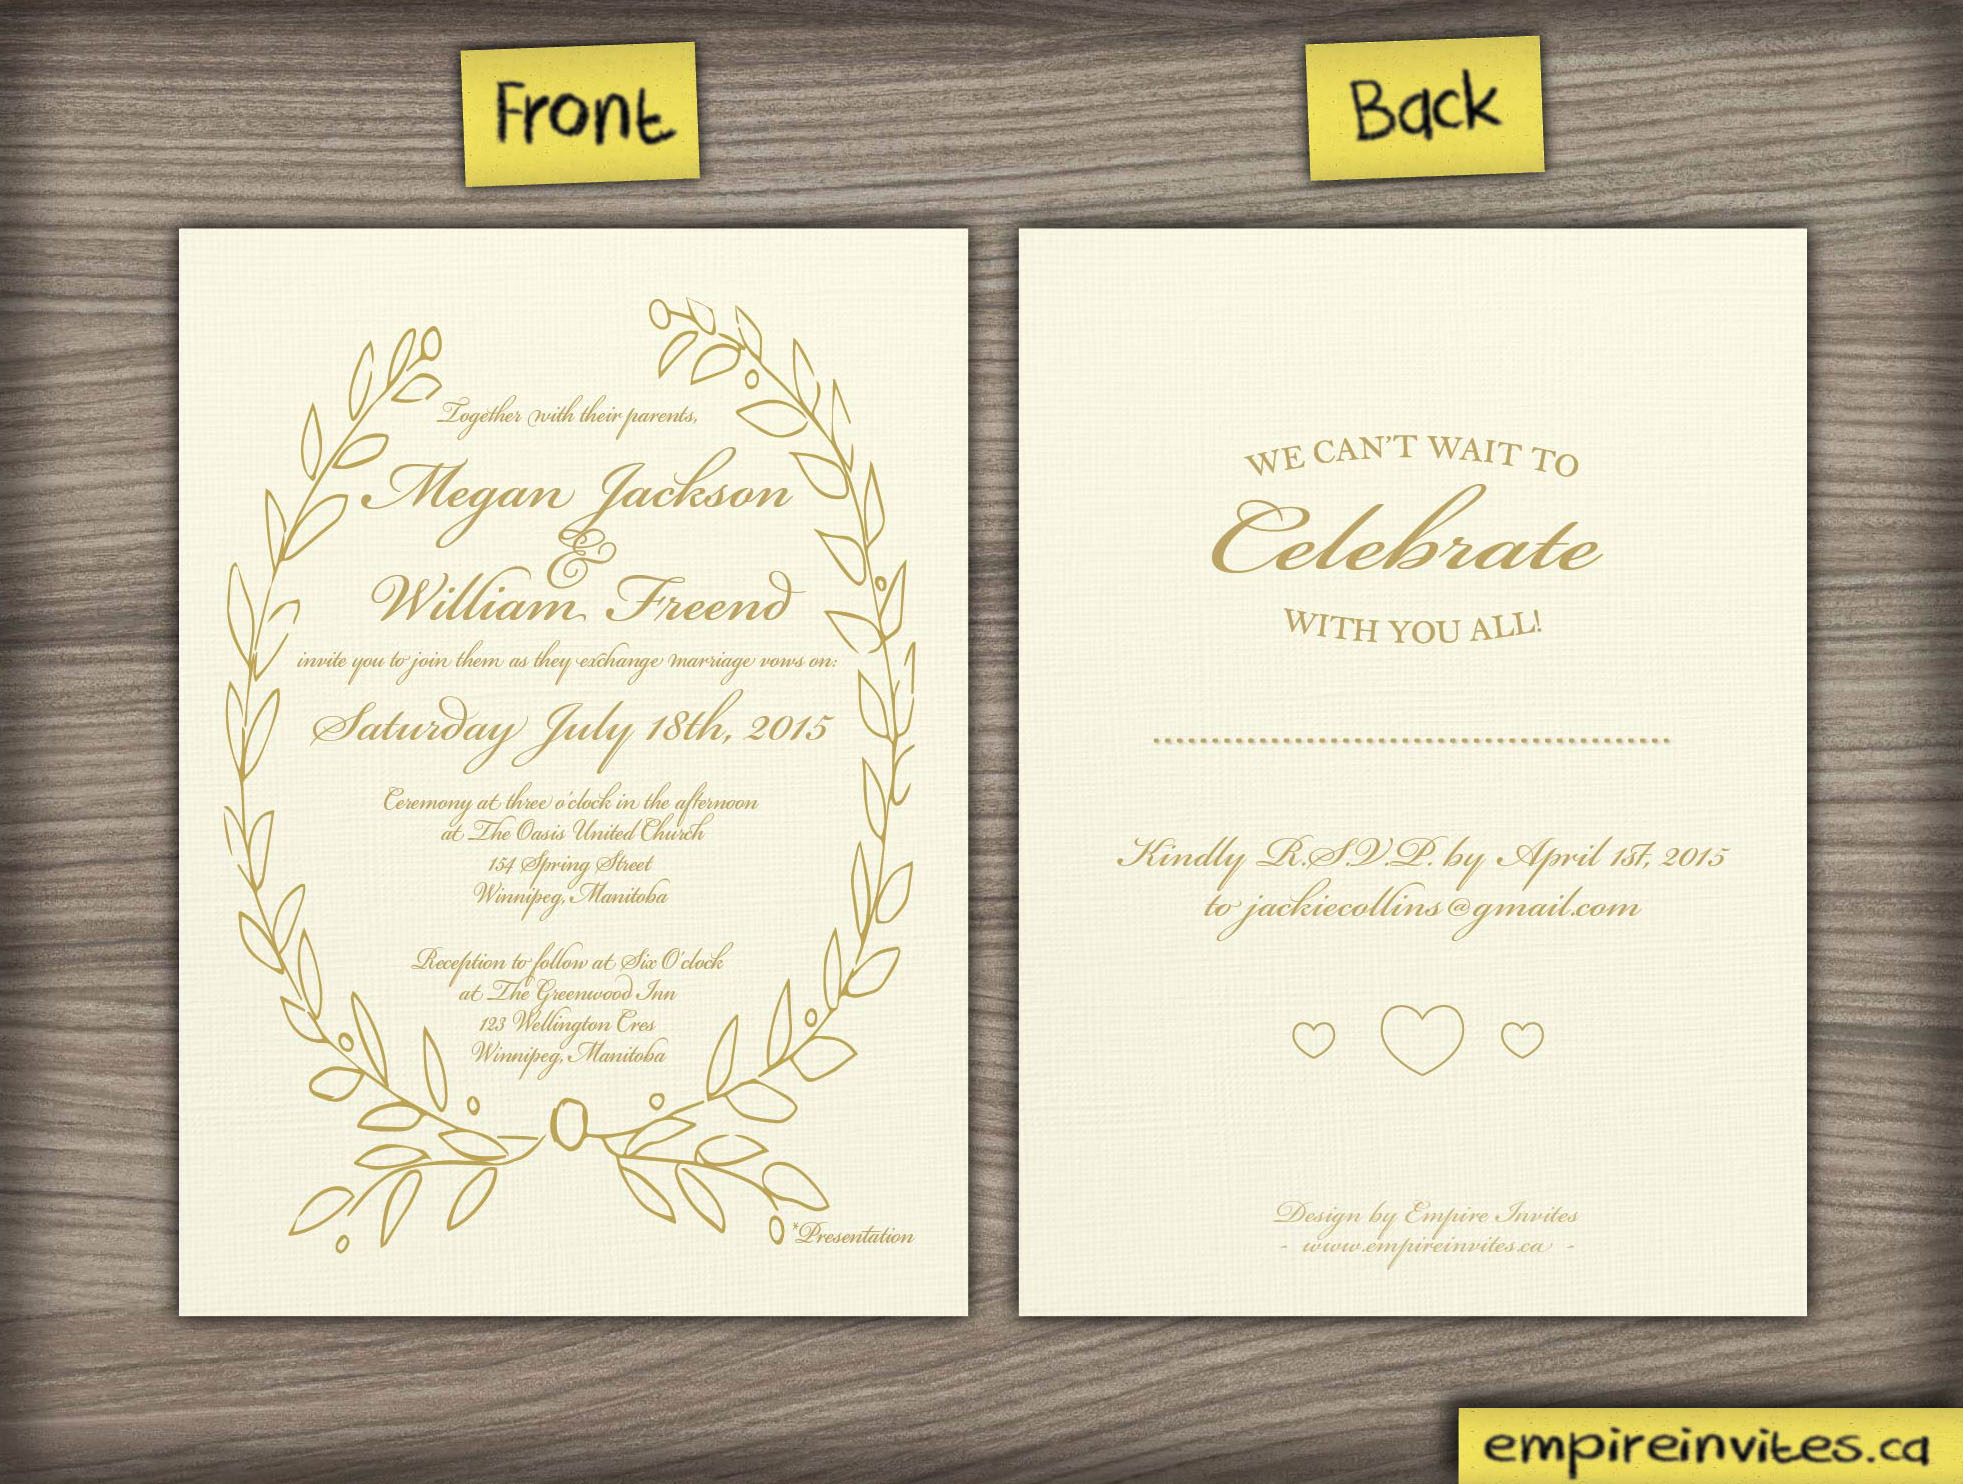 When Should I Mail My Wedding Invitations Ideas